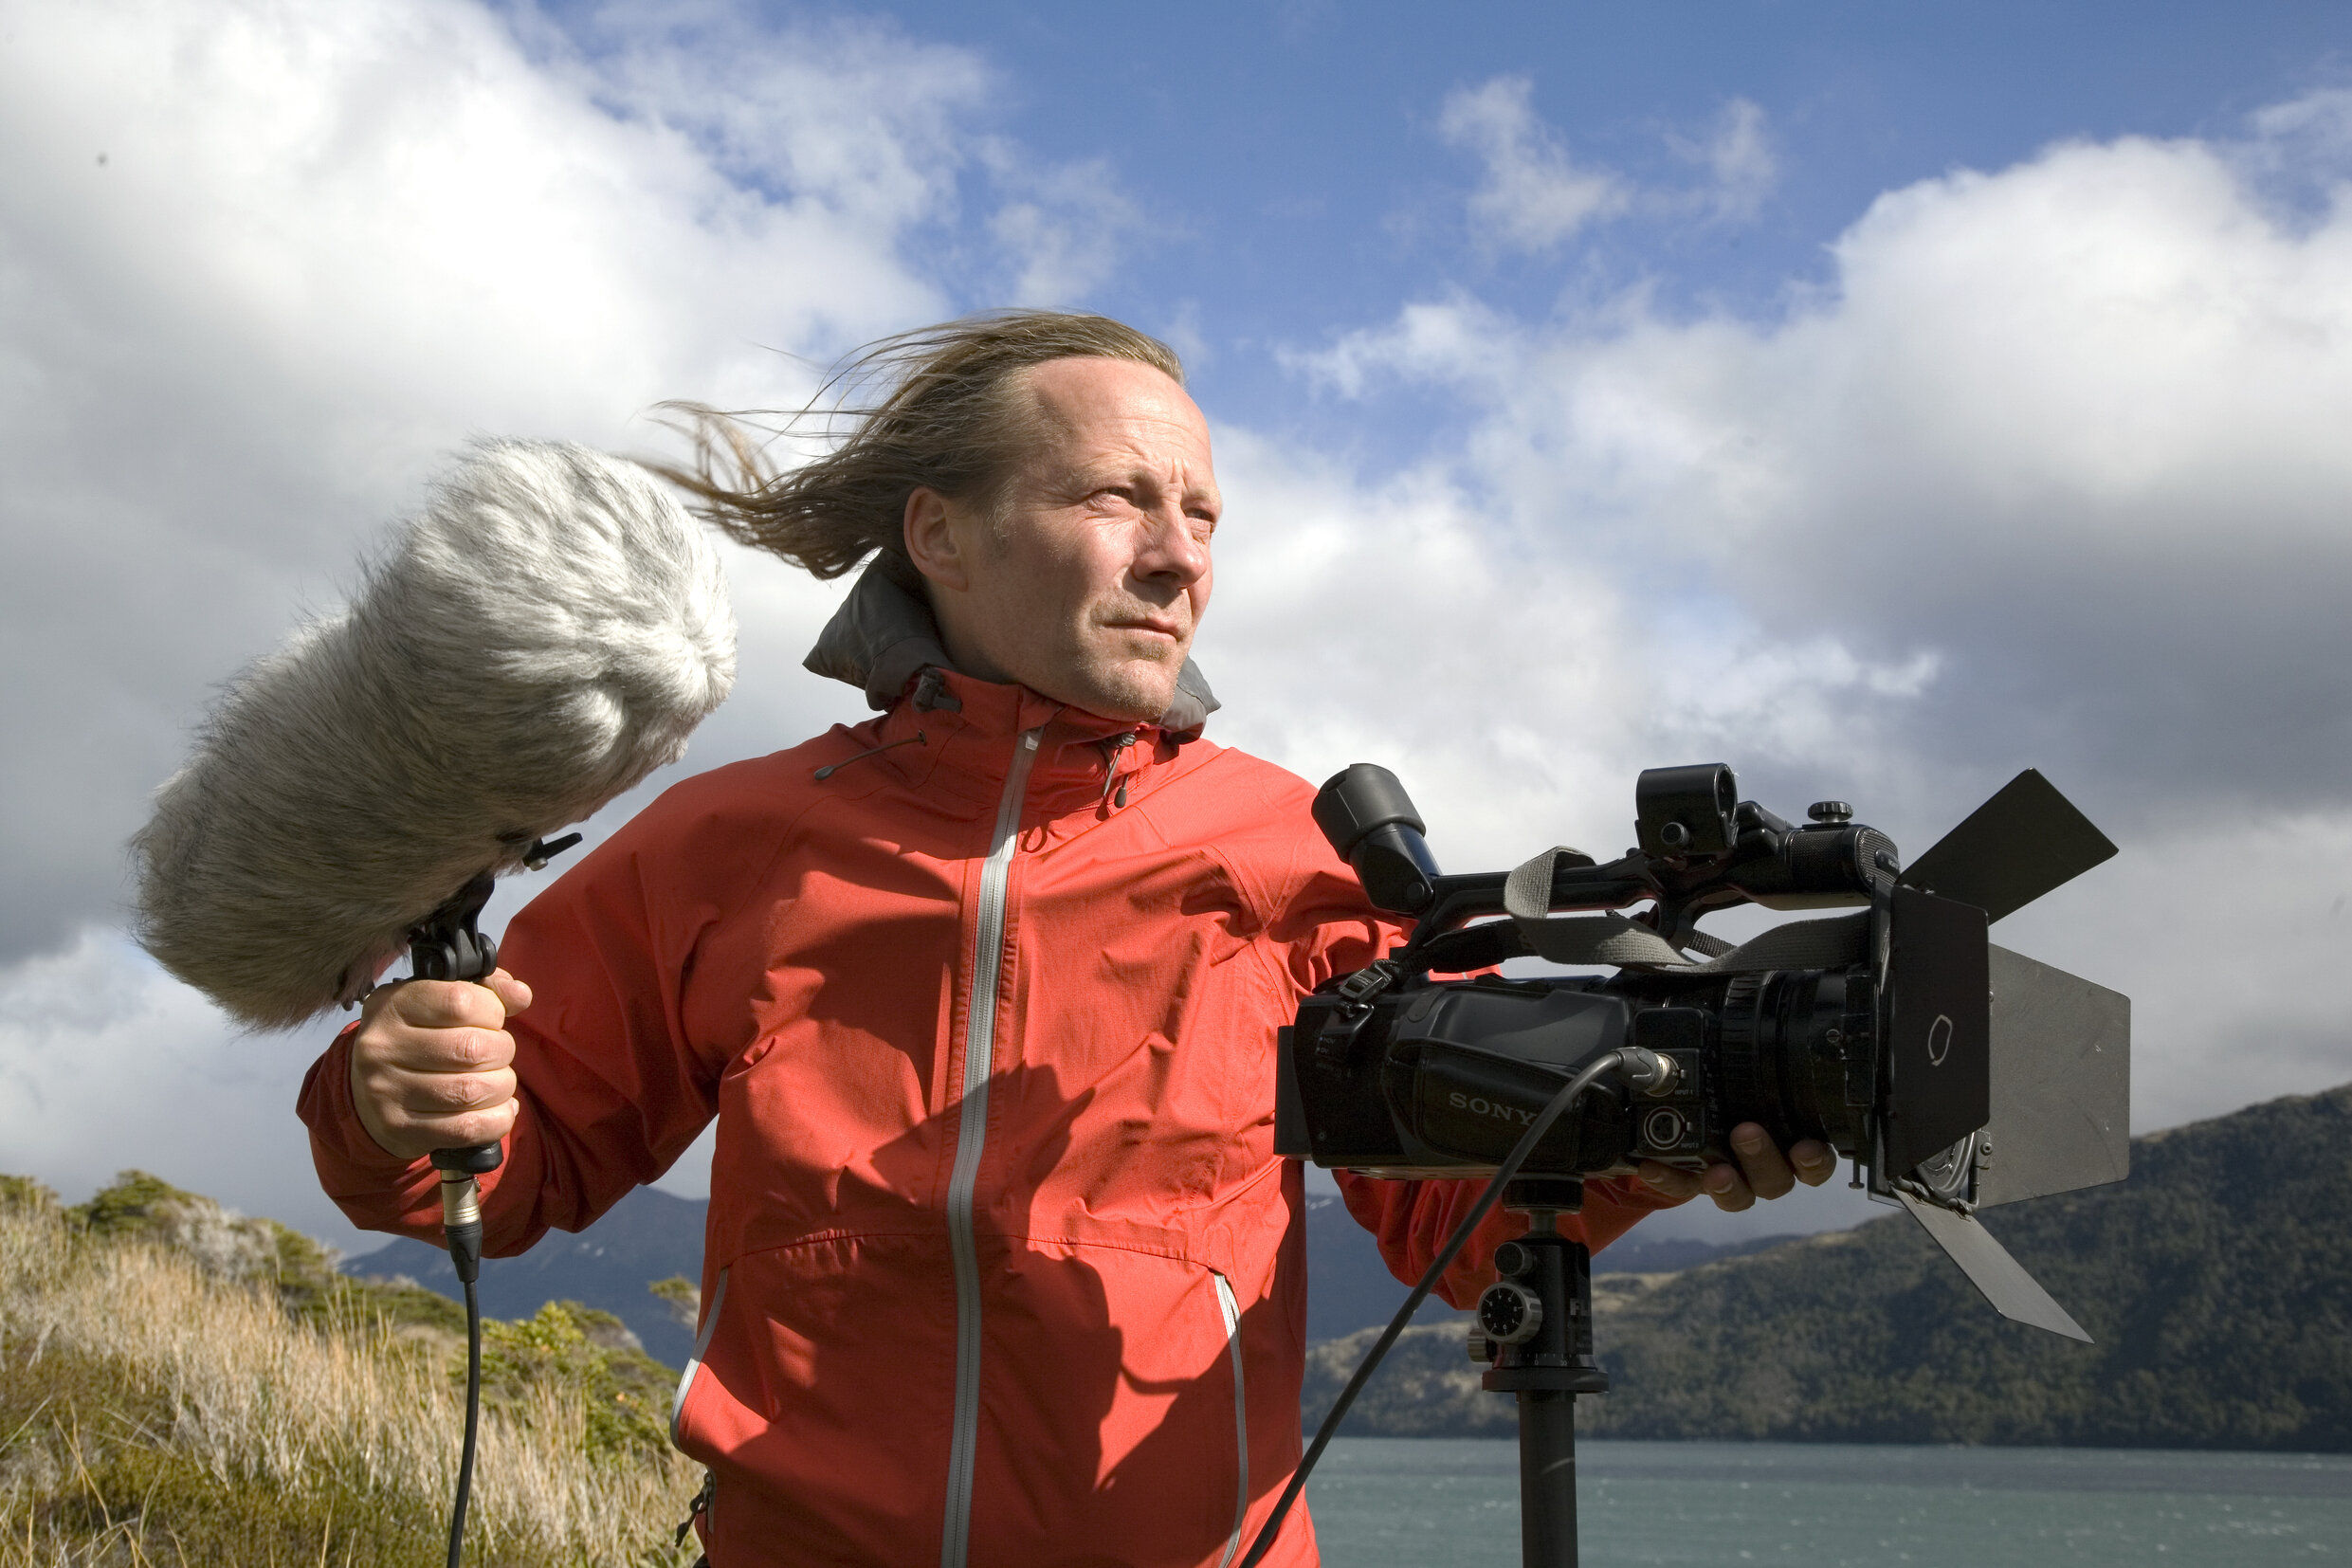 Mikrofonie Video Kamera 4.jpg